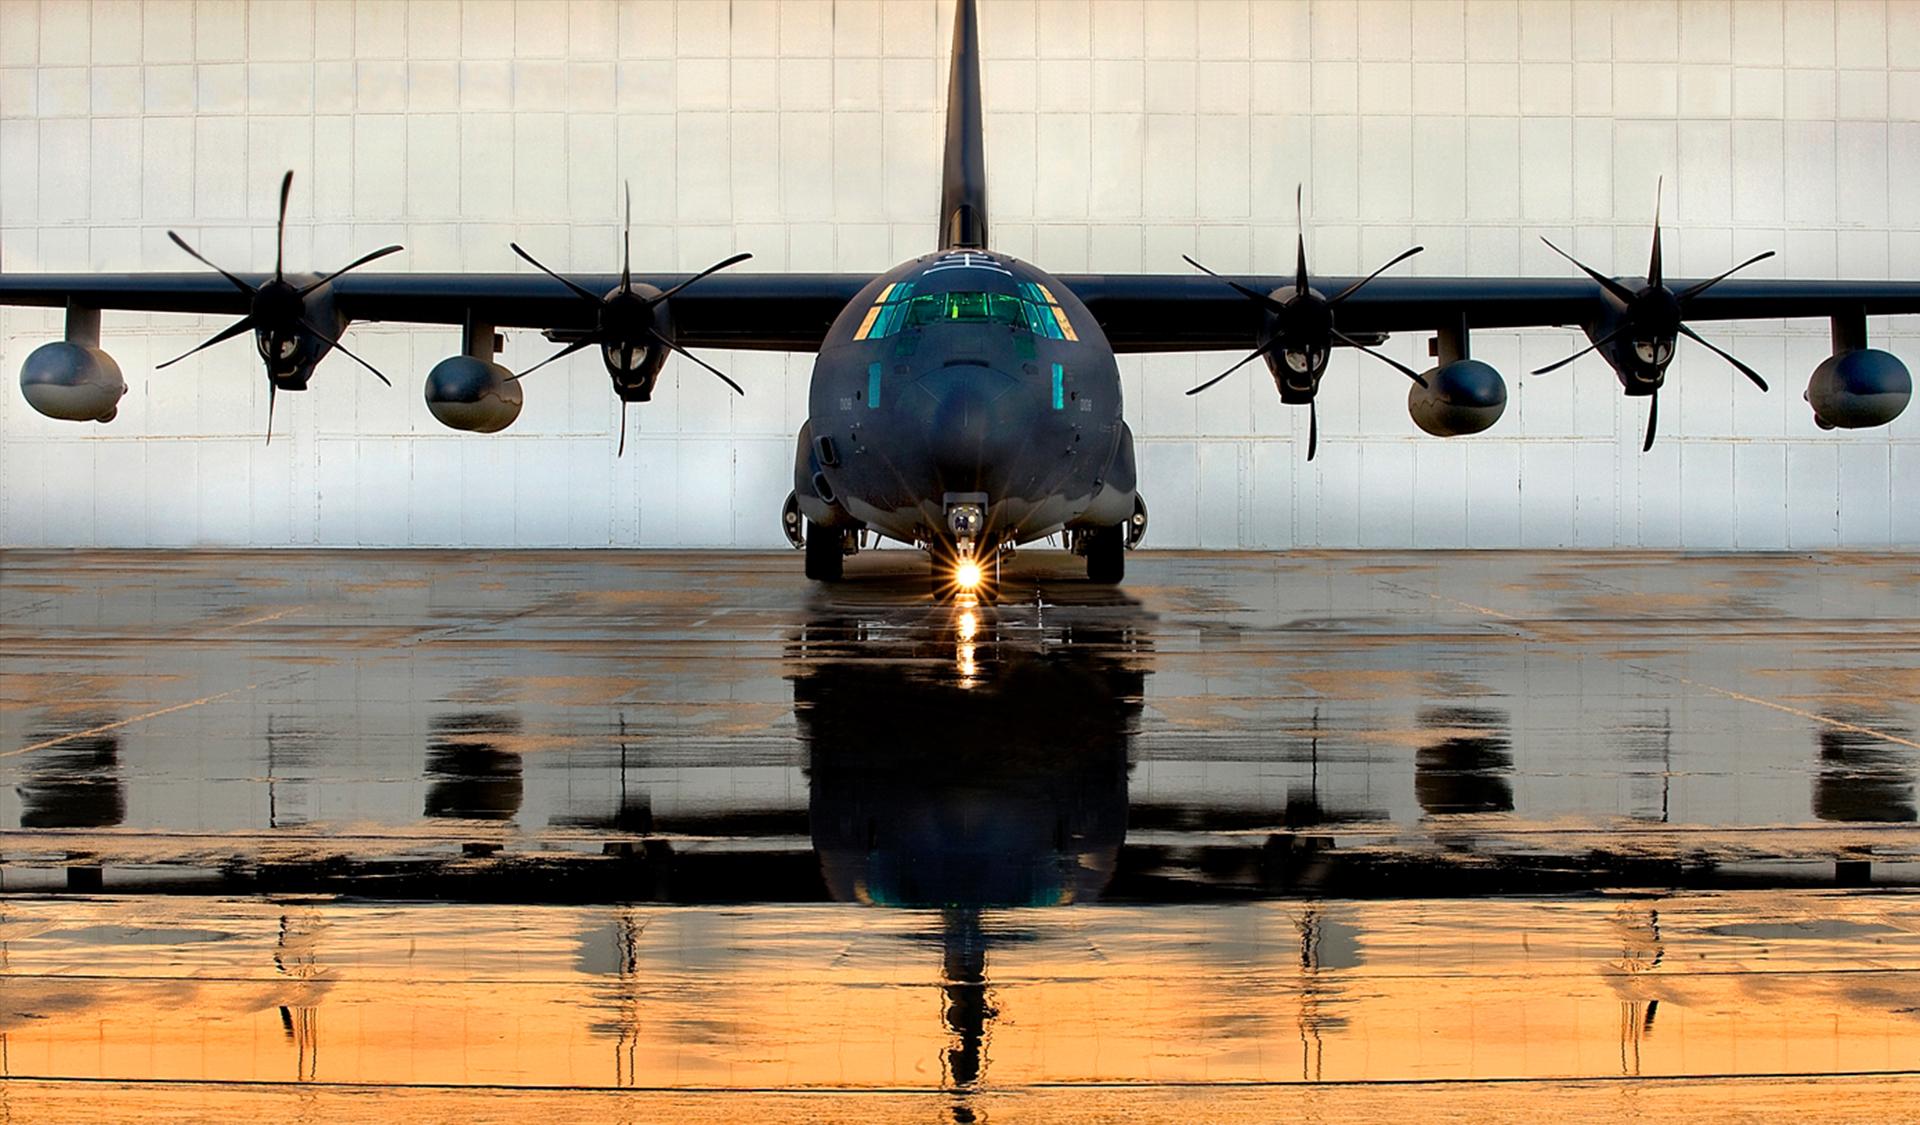 Hc 130j Combat King Ii Lockheed Martin